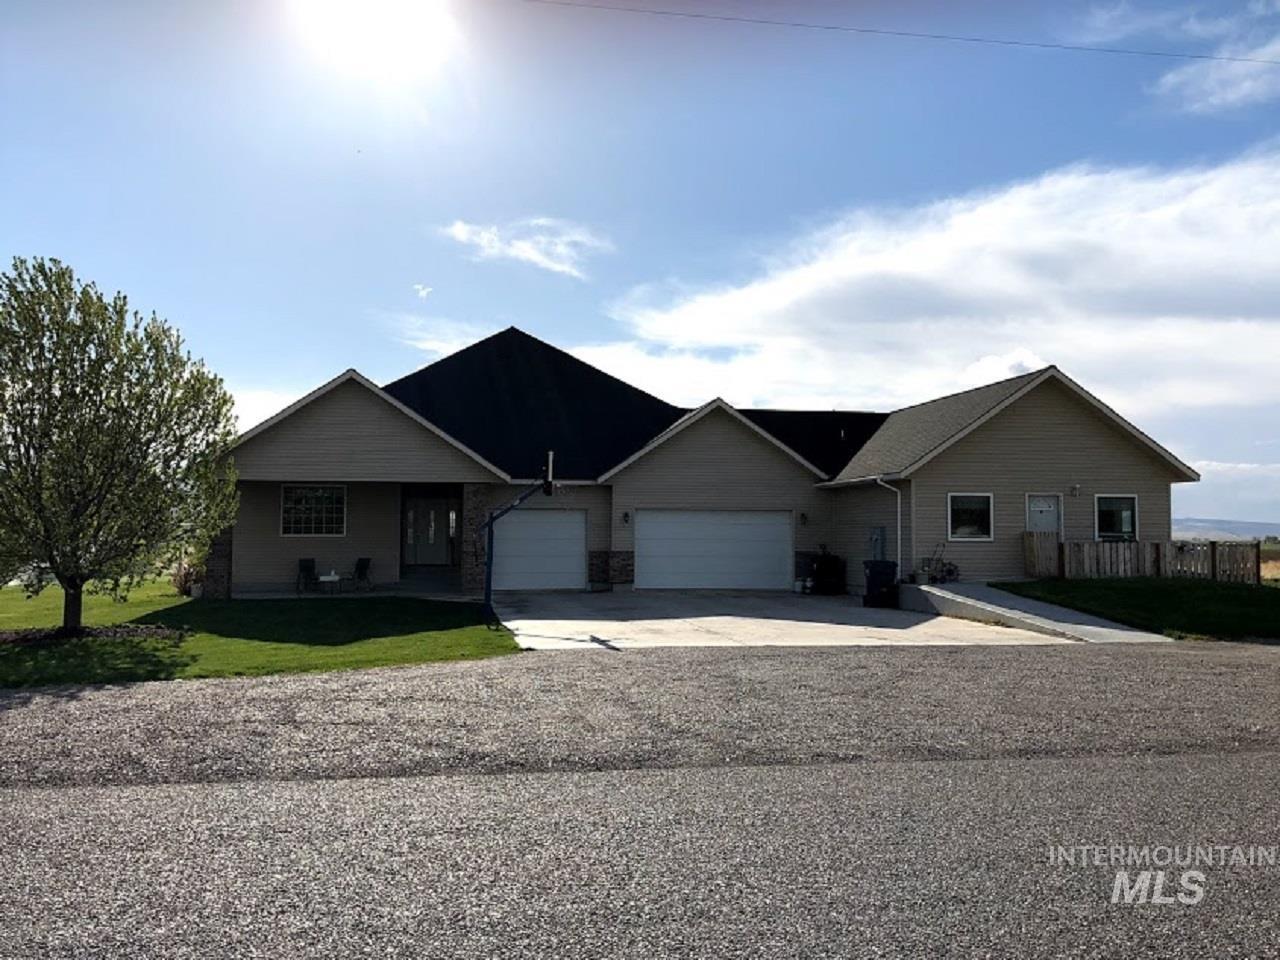 435 S College Property Photo 2